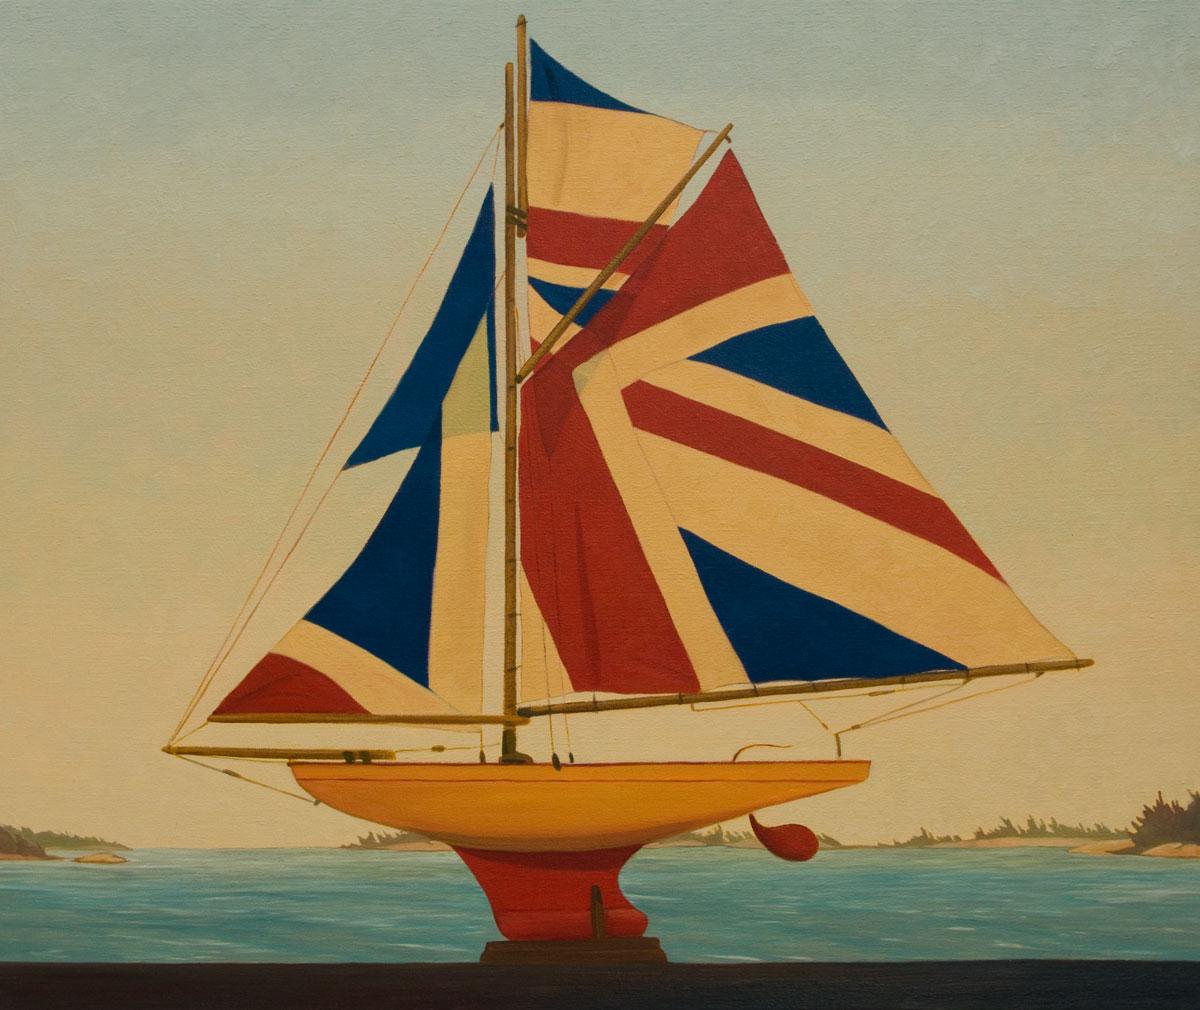 fenton-union-jack-pond-yacht-32x38-2011.jpg